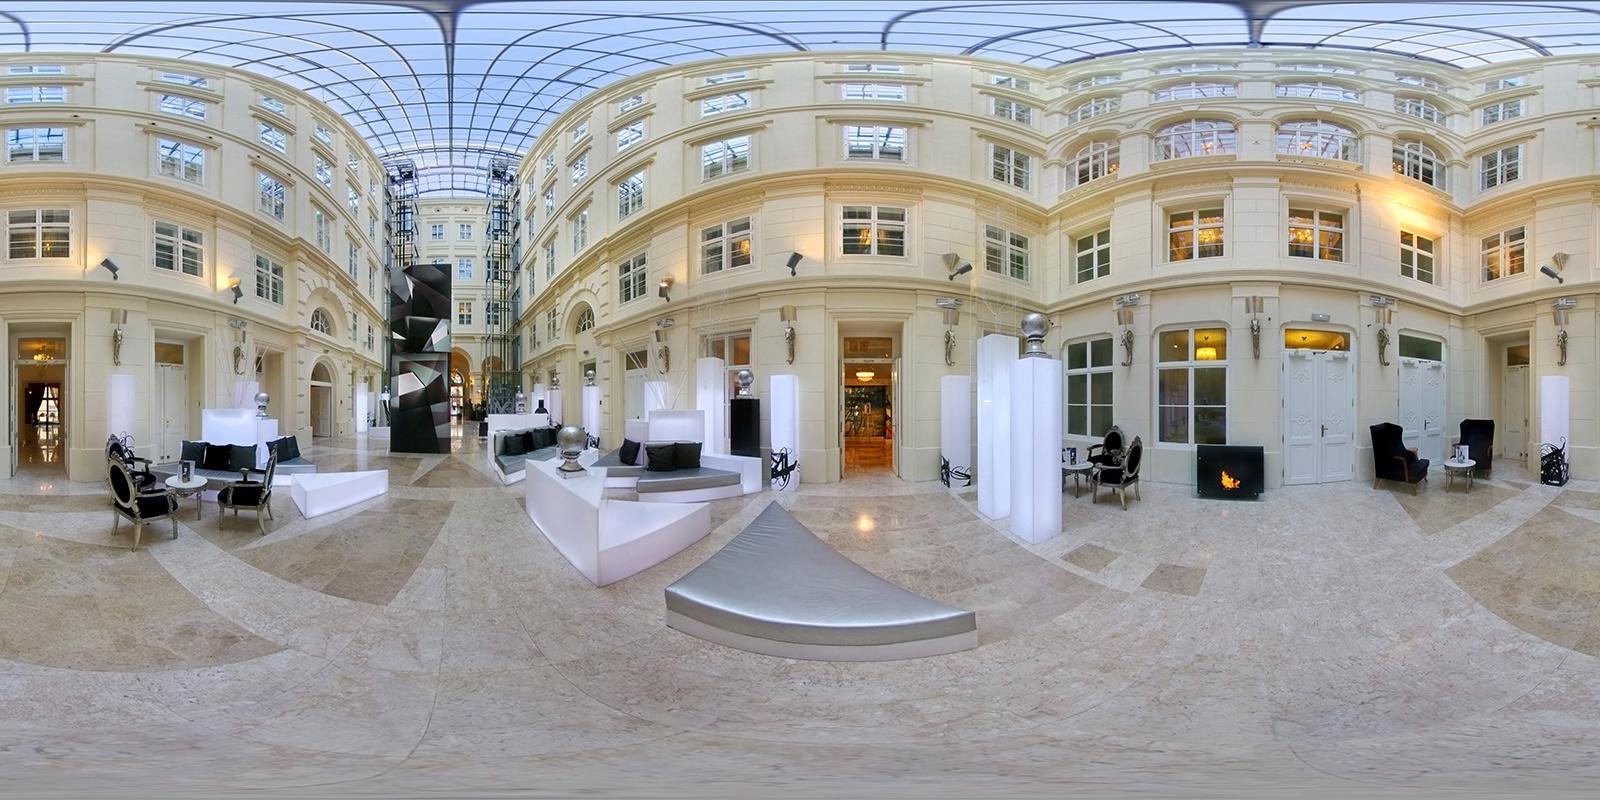 Hotel Barcelo / Brno / Czech Republic